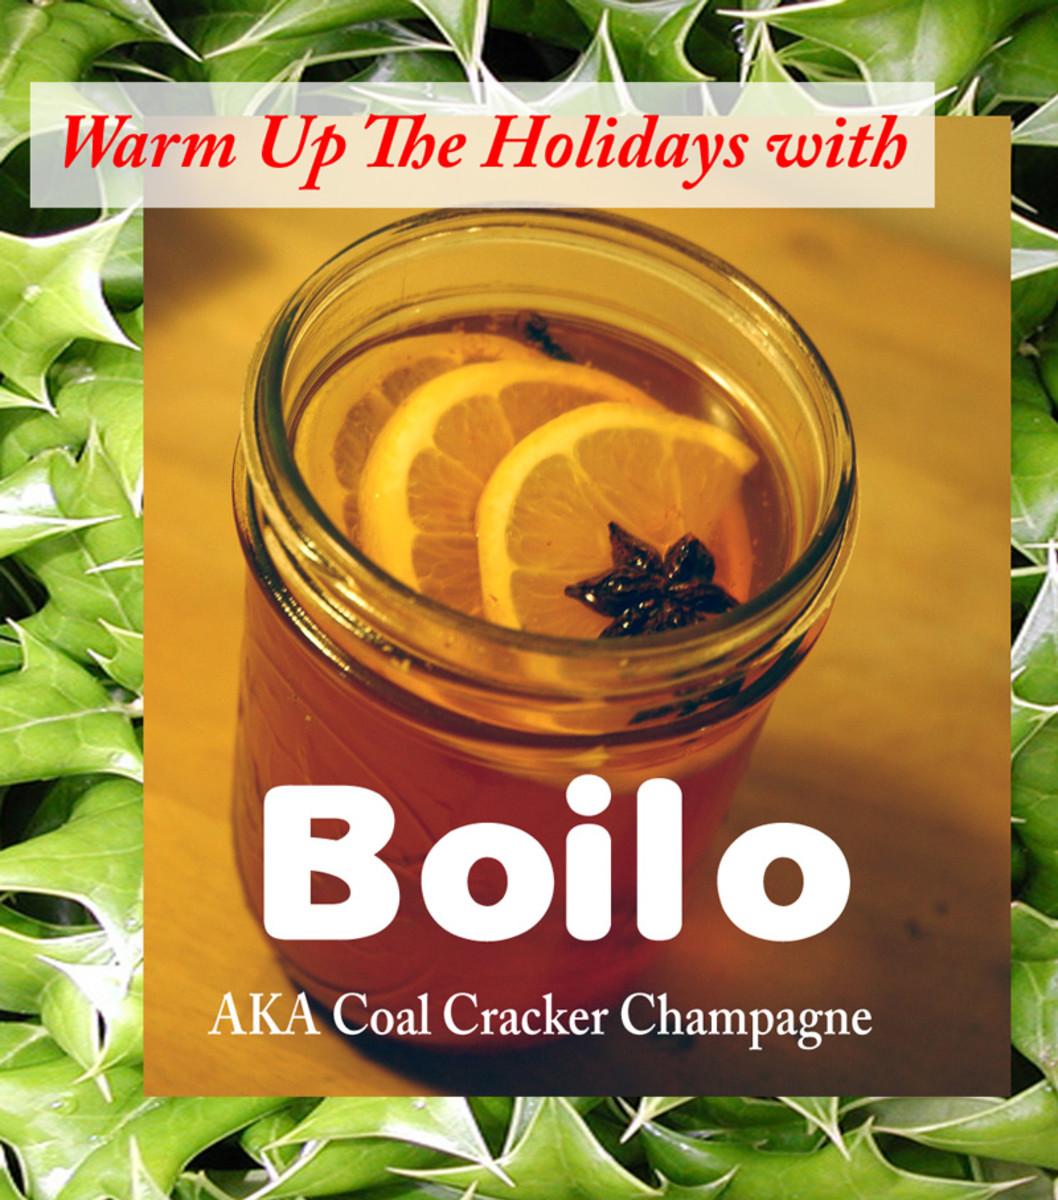 boilo-moonshine-wassail-pennsylvania